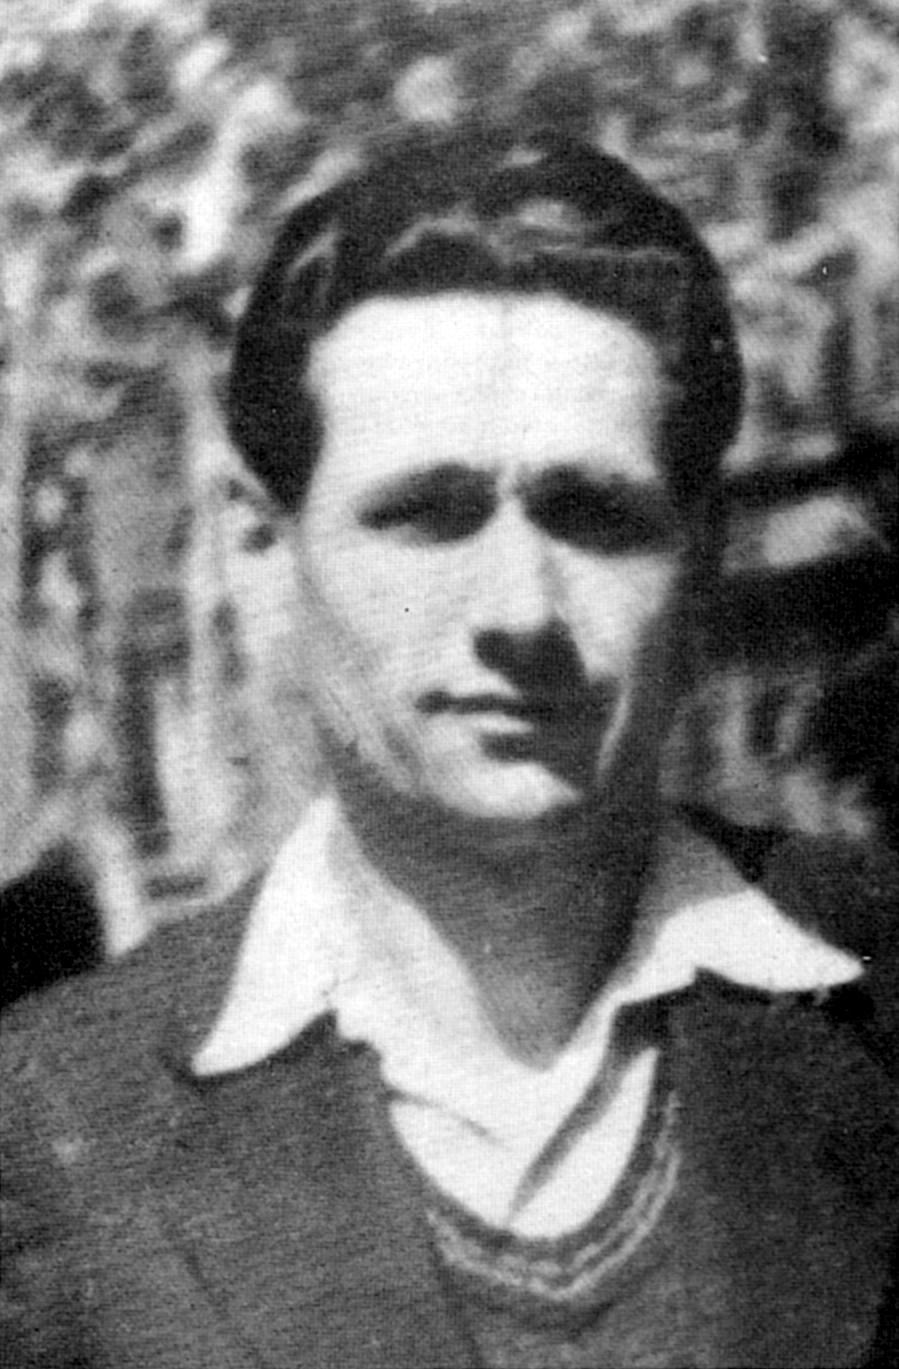 Josep Sabaté Llopart